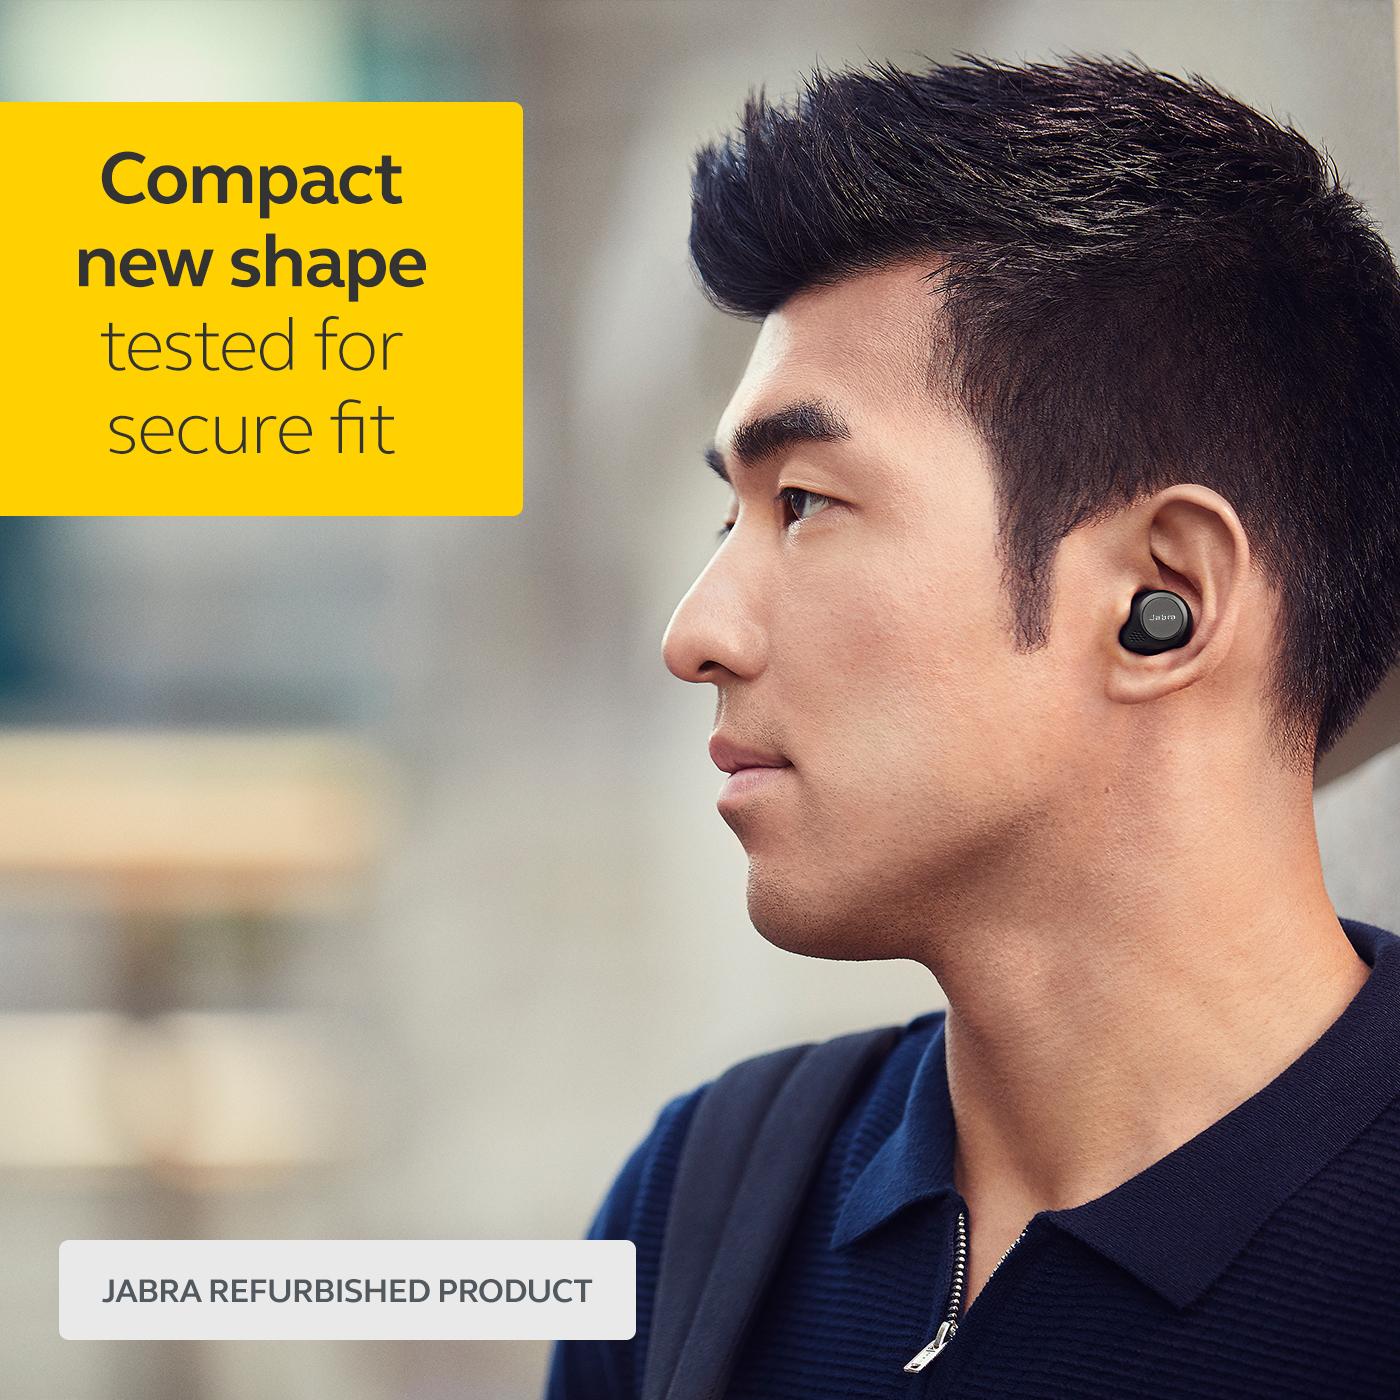 thumbnail 8 - Jabra-Elite-75t-Voice-Assistant-True-Wireless-earbuds-Certified-Refurbished